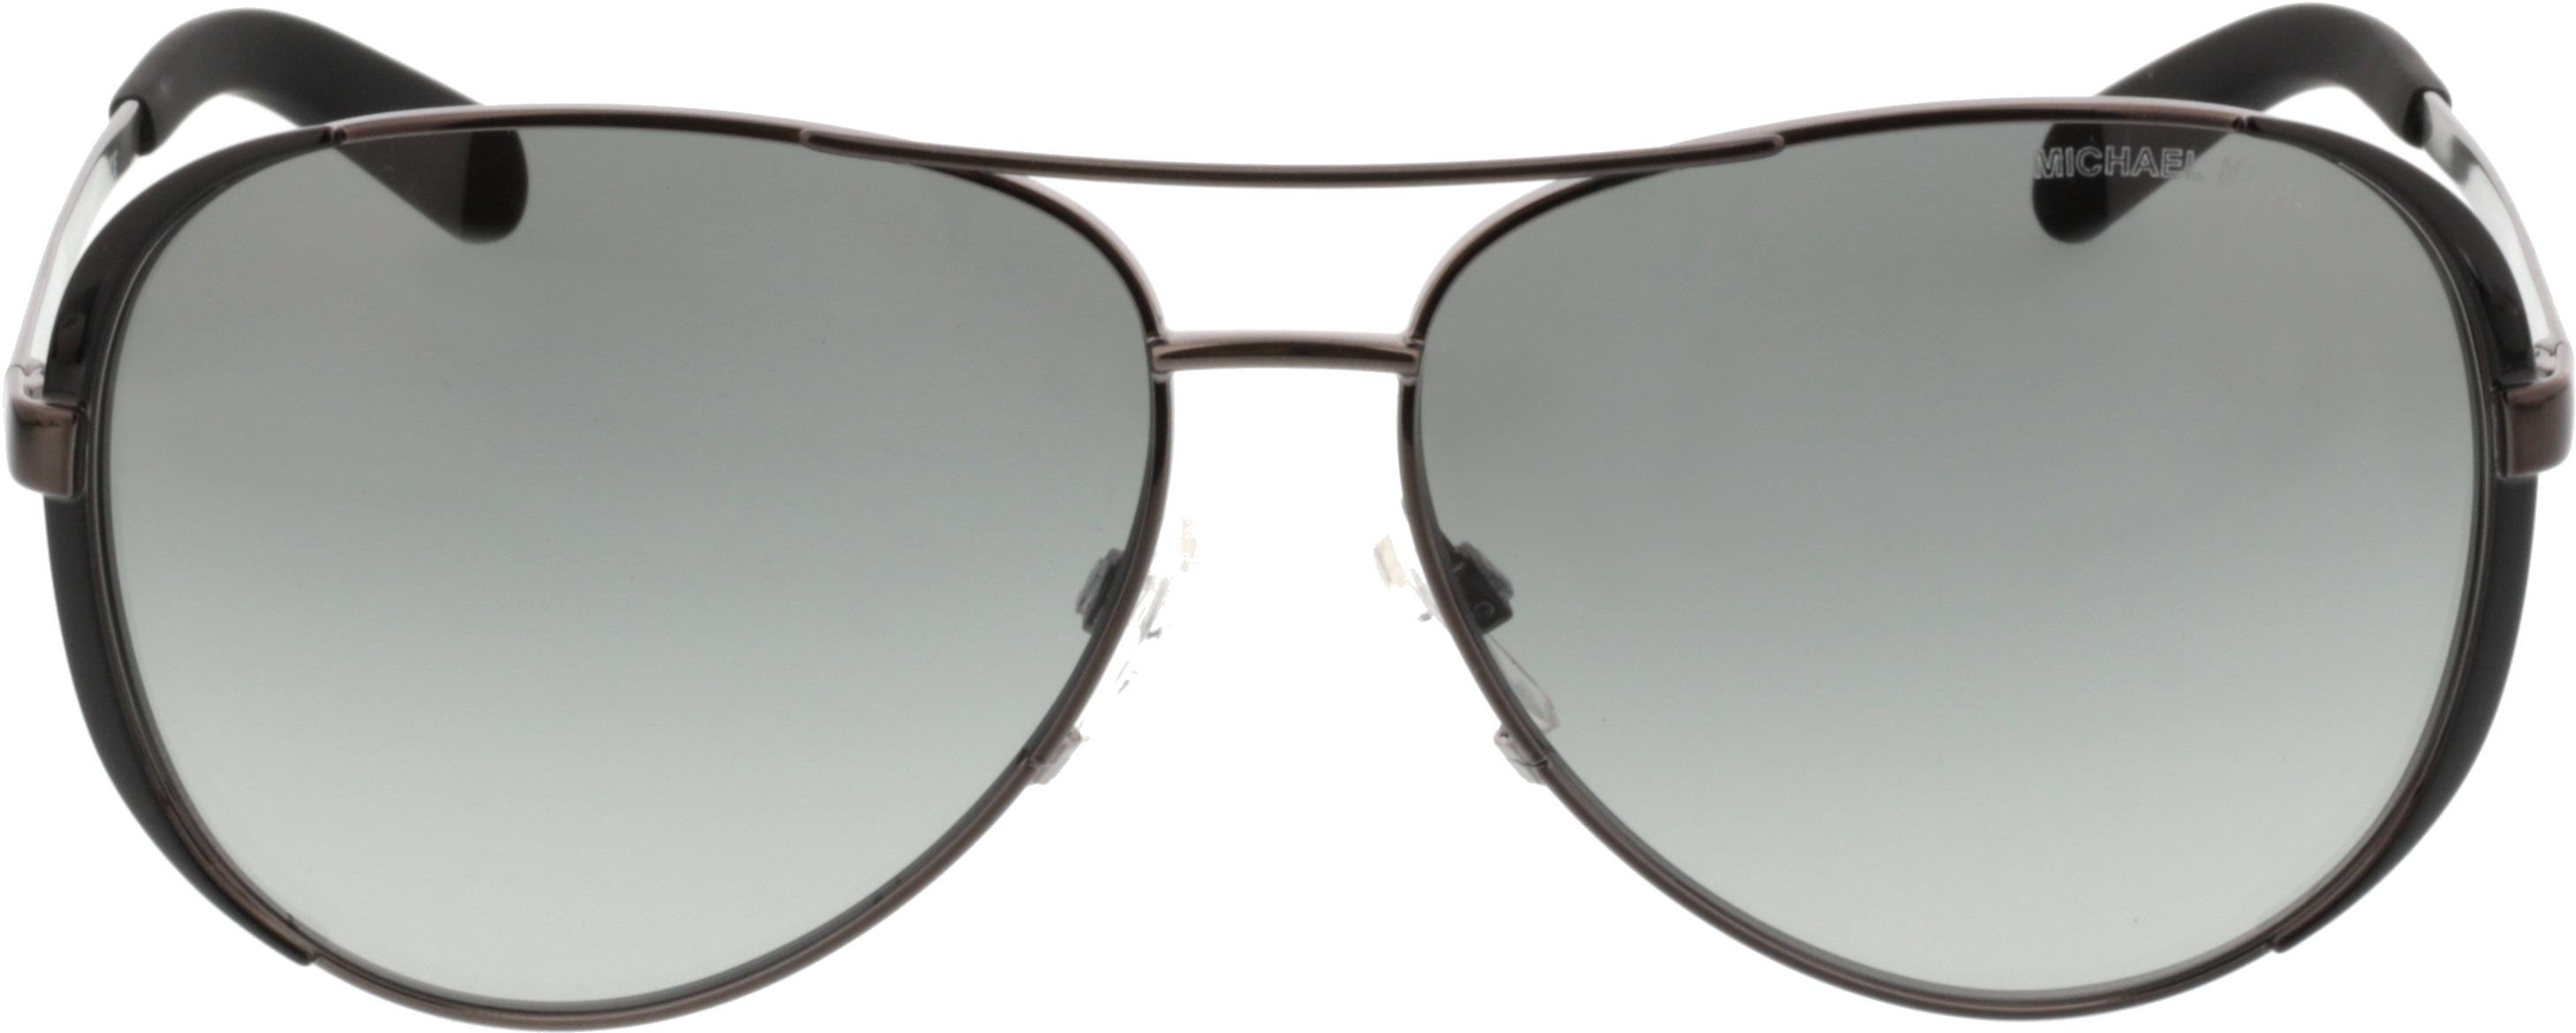 Picture of glasses model Michael Kors Chelsea MK5004 101311 59-13 in angle 0